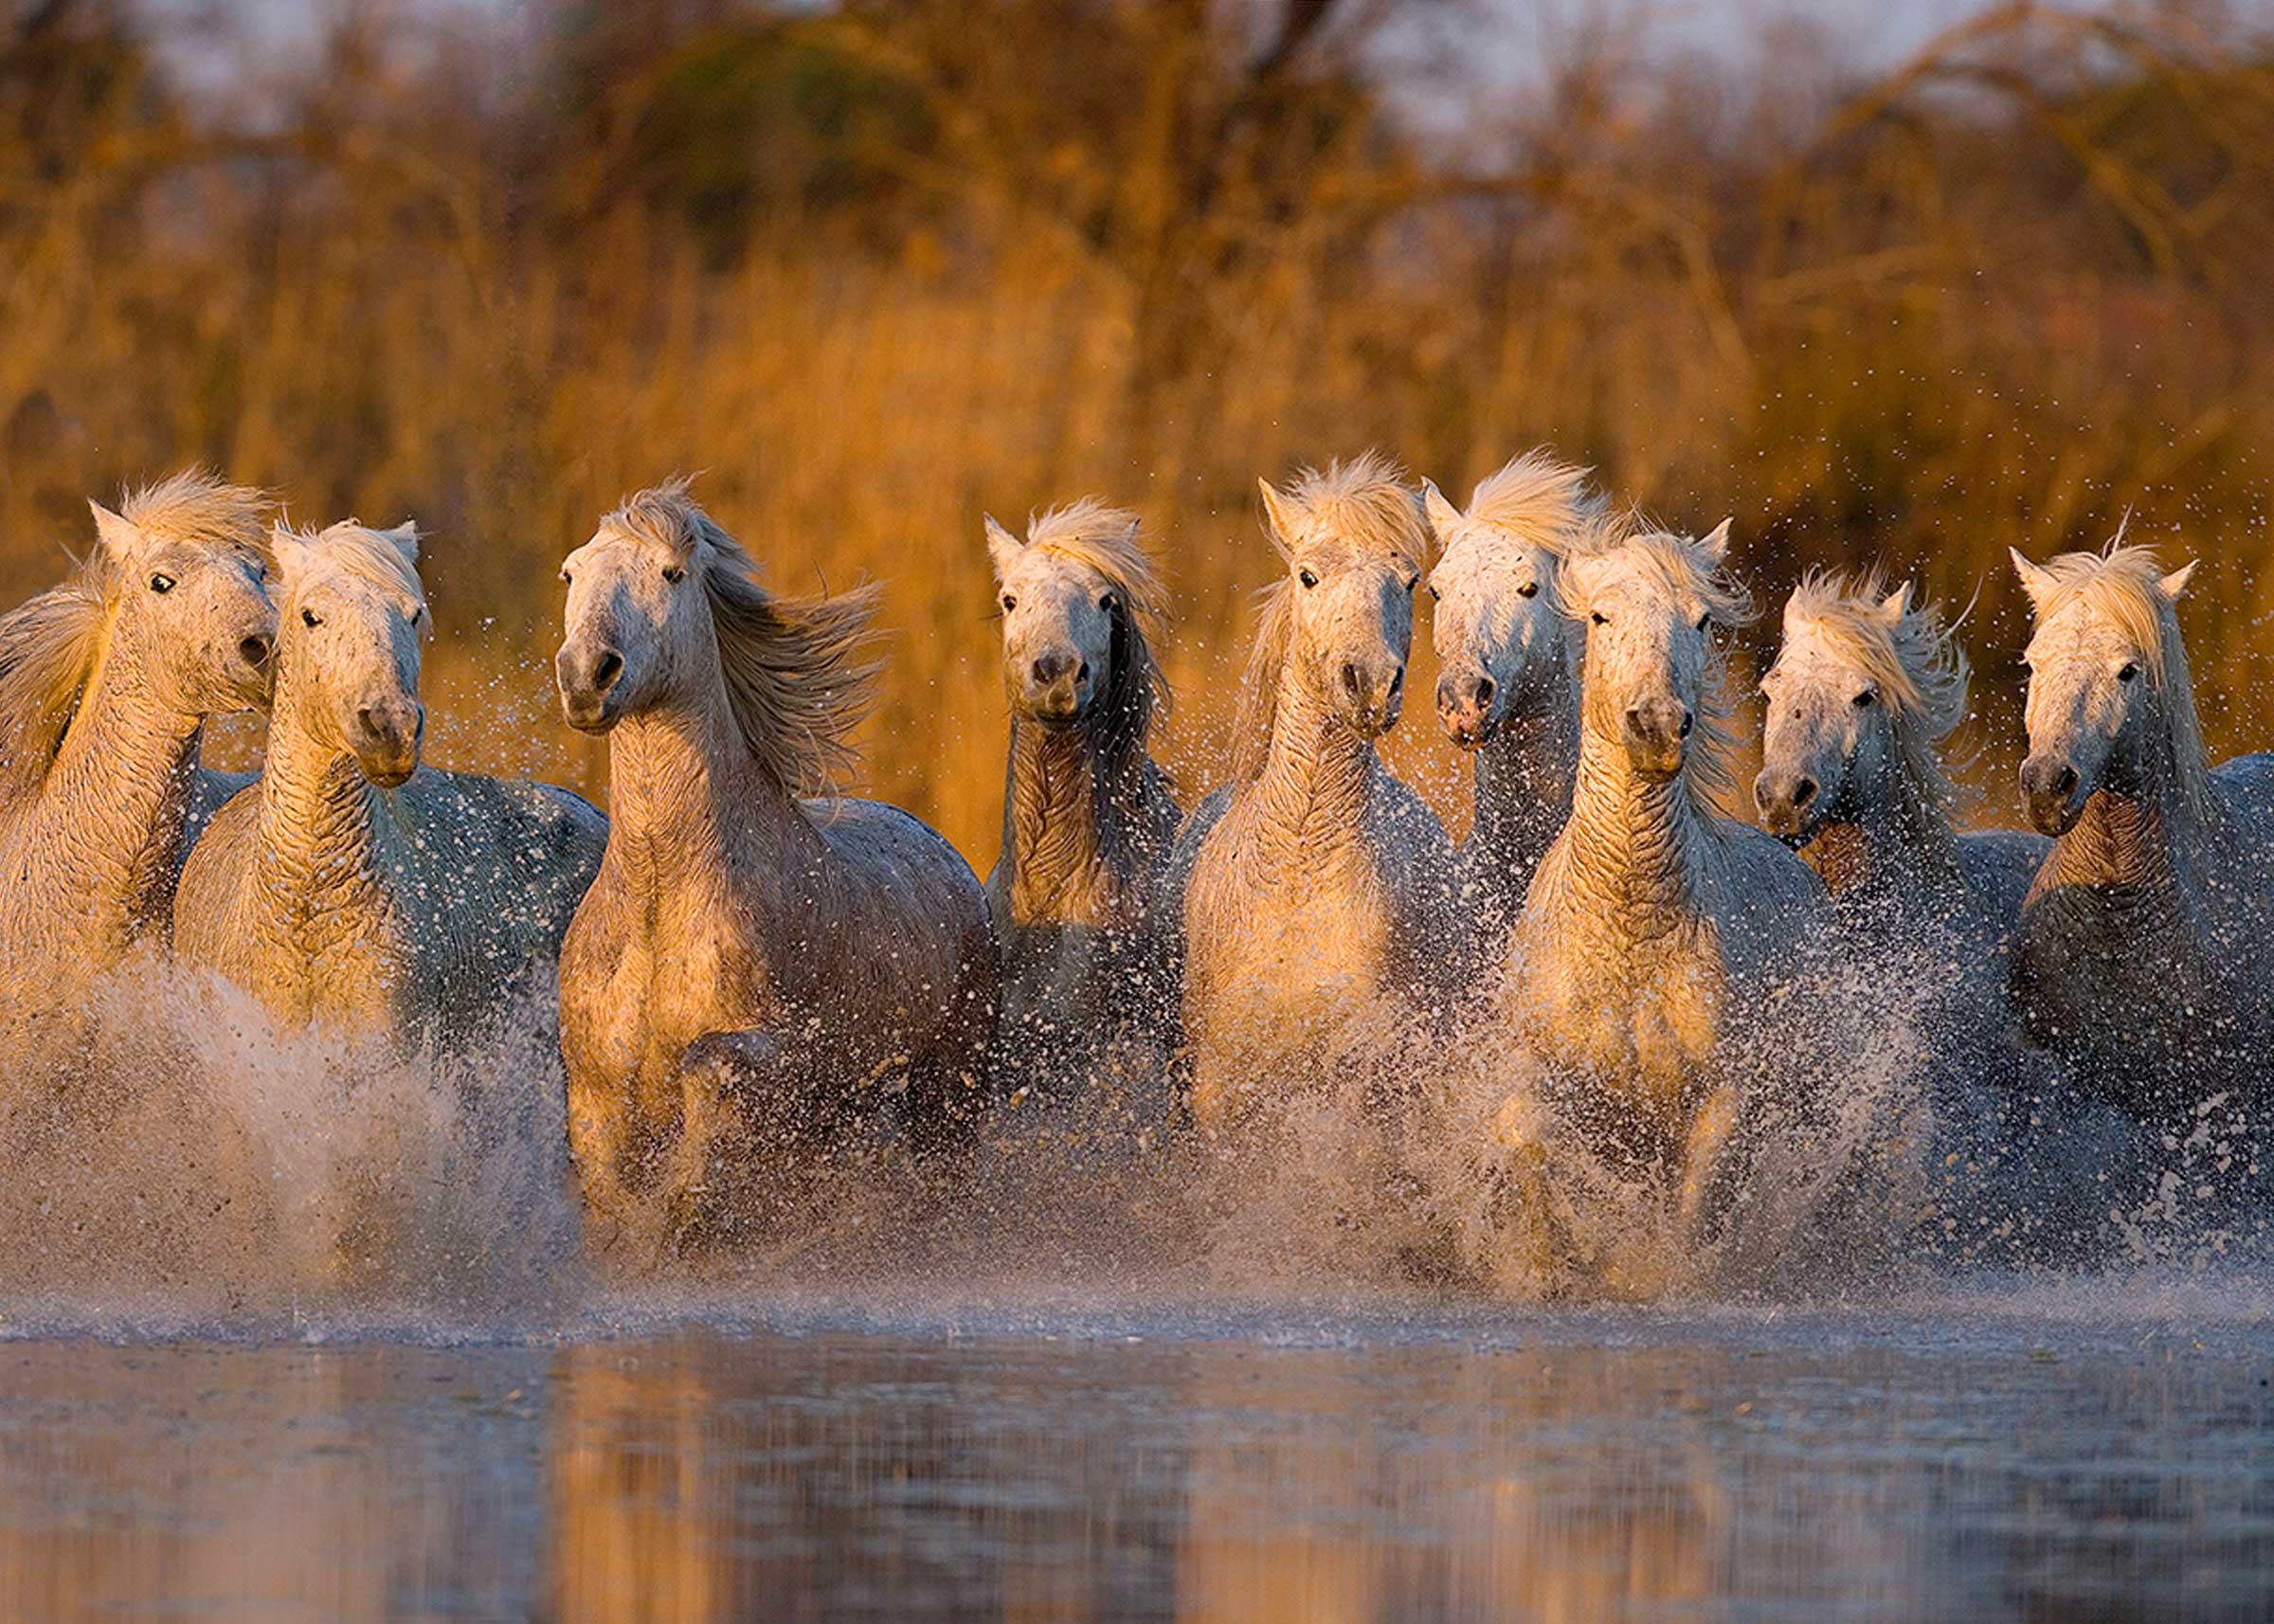 White horses of Camargue by Jim Zuckerman